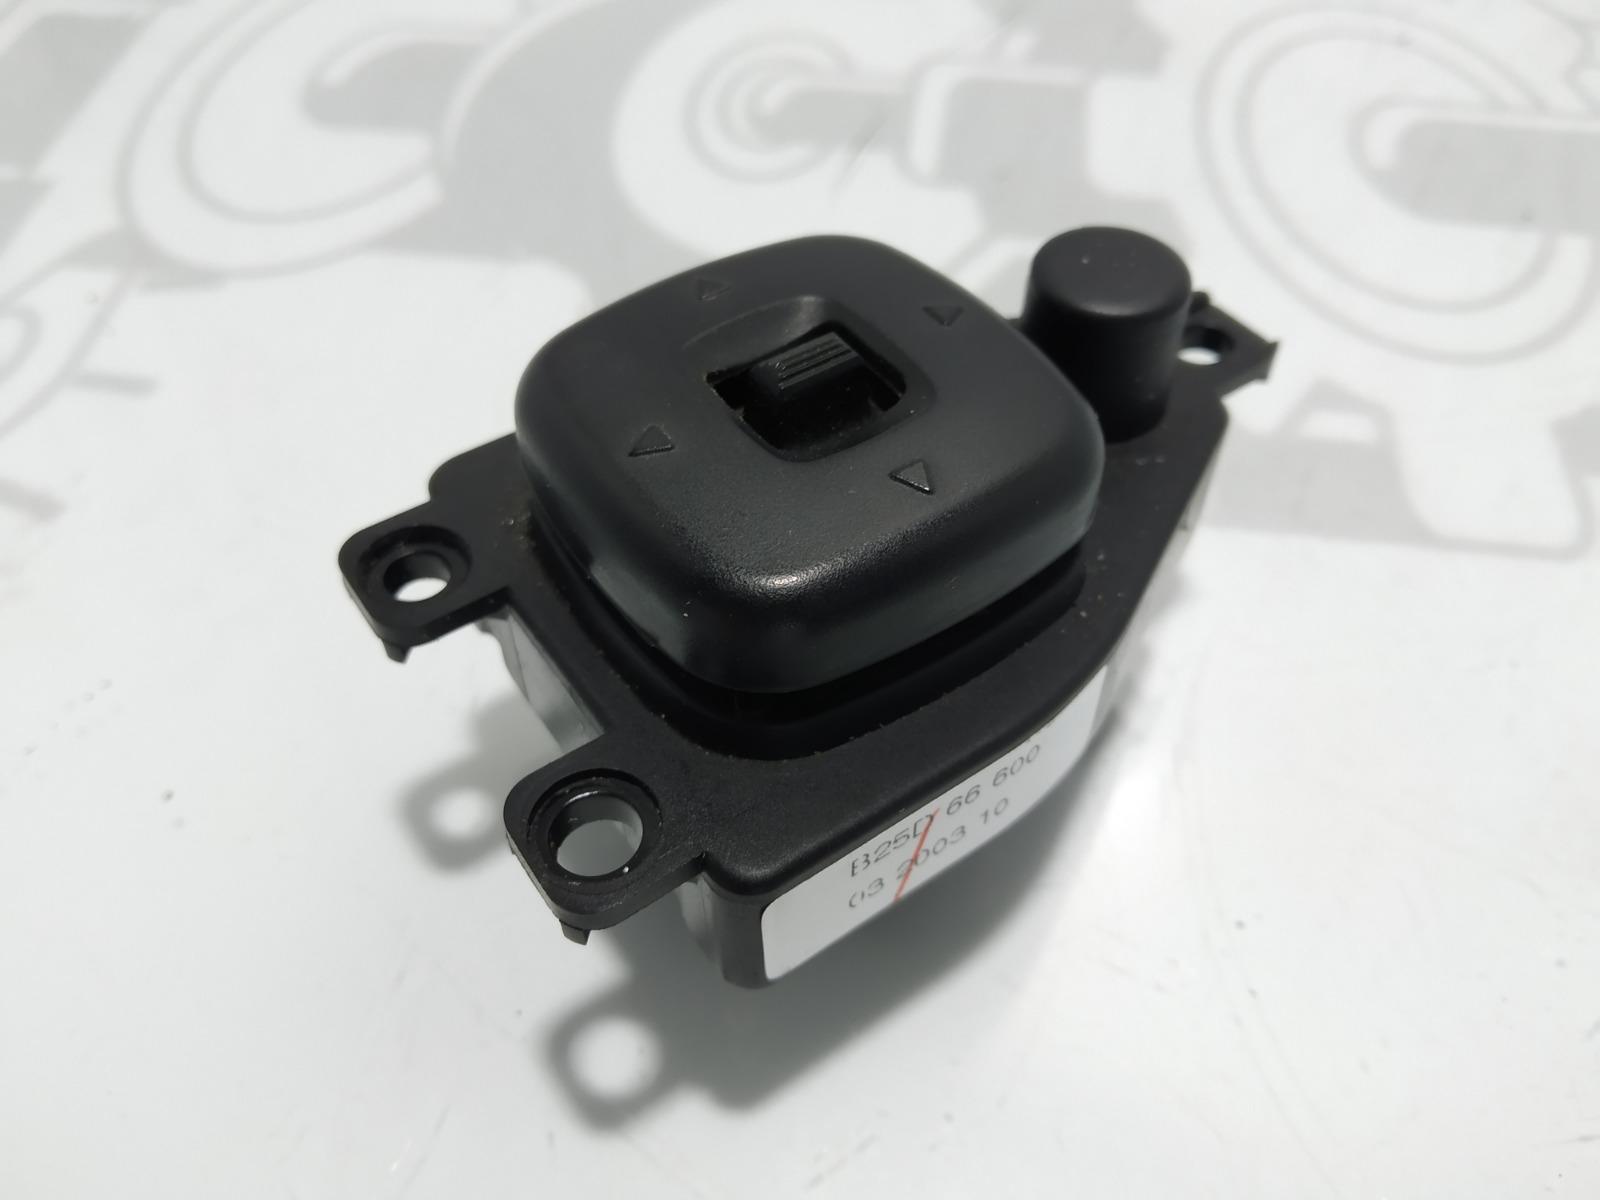 Джойстик регулировки зеркал Mazda 3 BK 2.0 I 2004 (б/у)